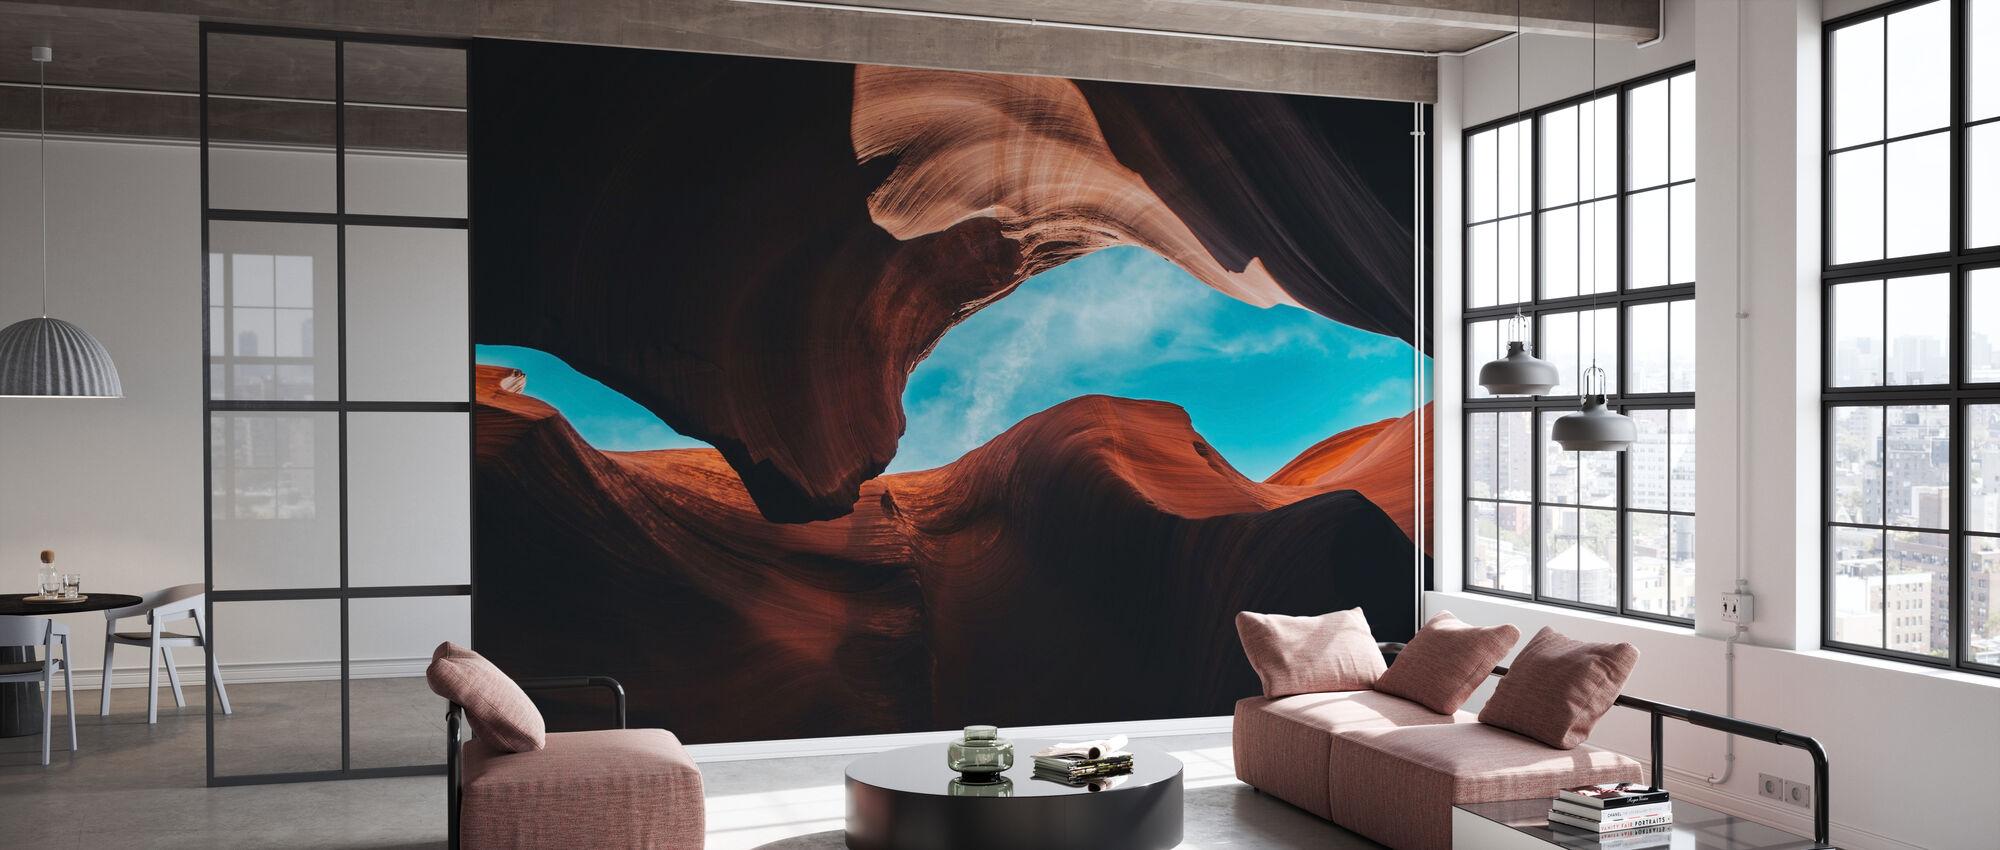 Canyon dell'antilope - Carta da parati - Uffici